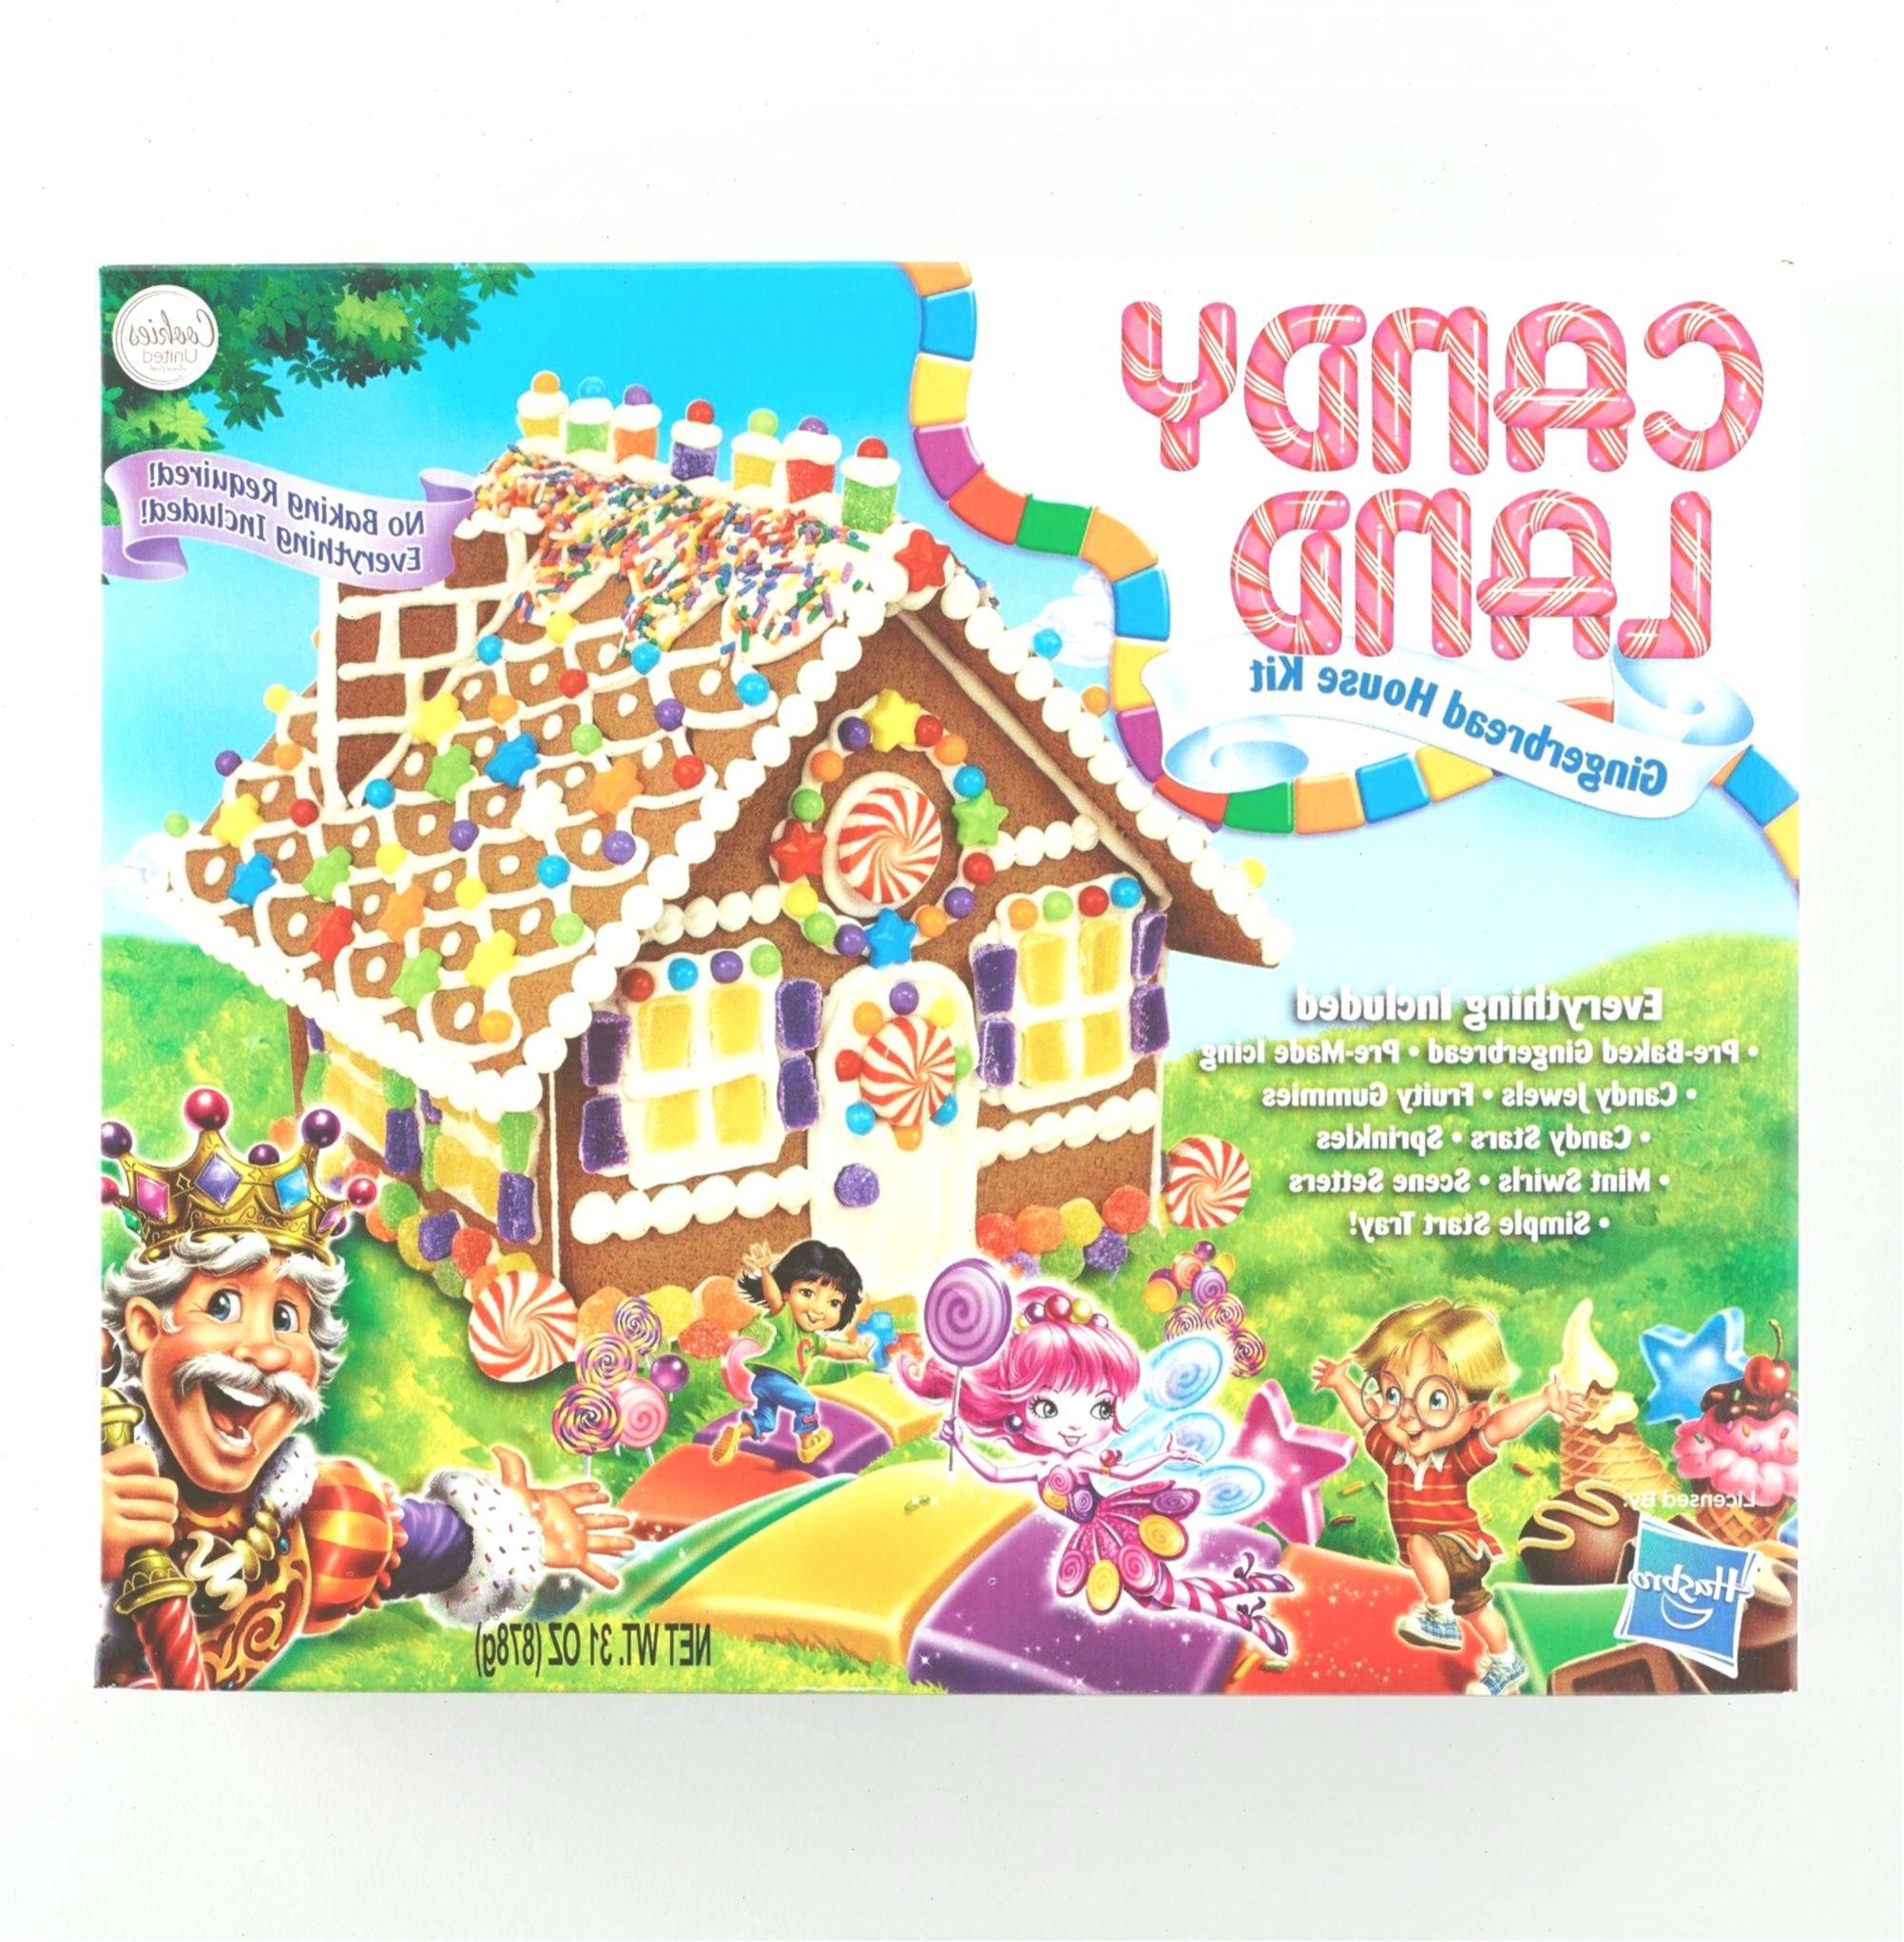 Candyland Gingerbread House Kit by World Market